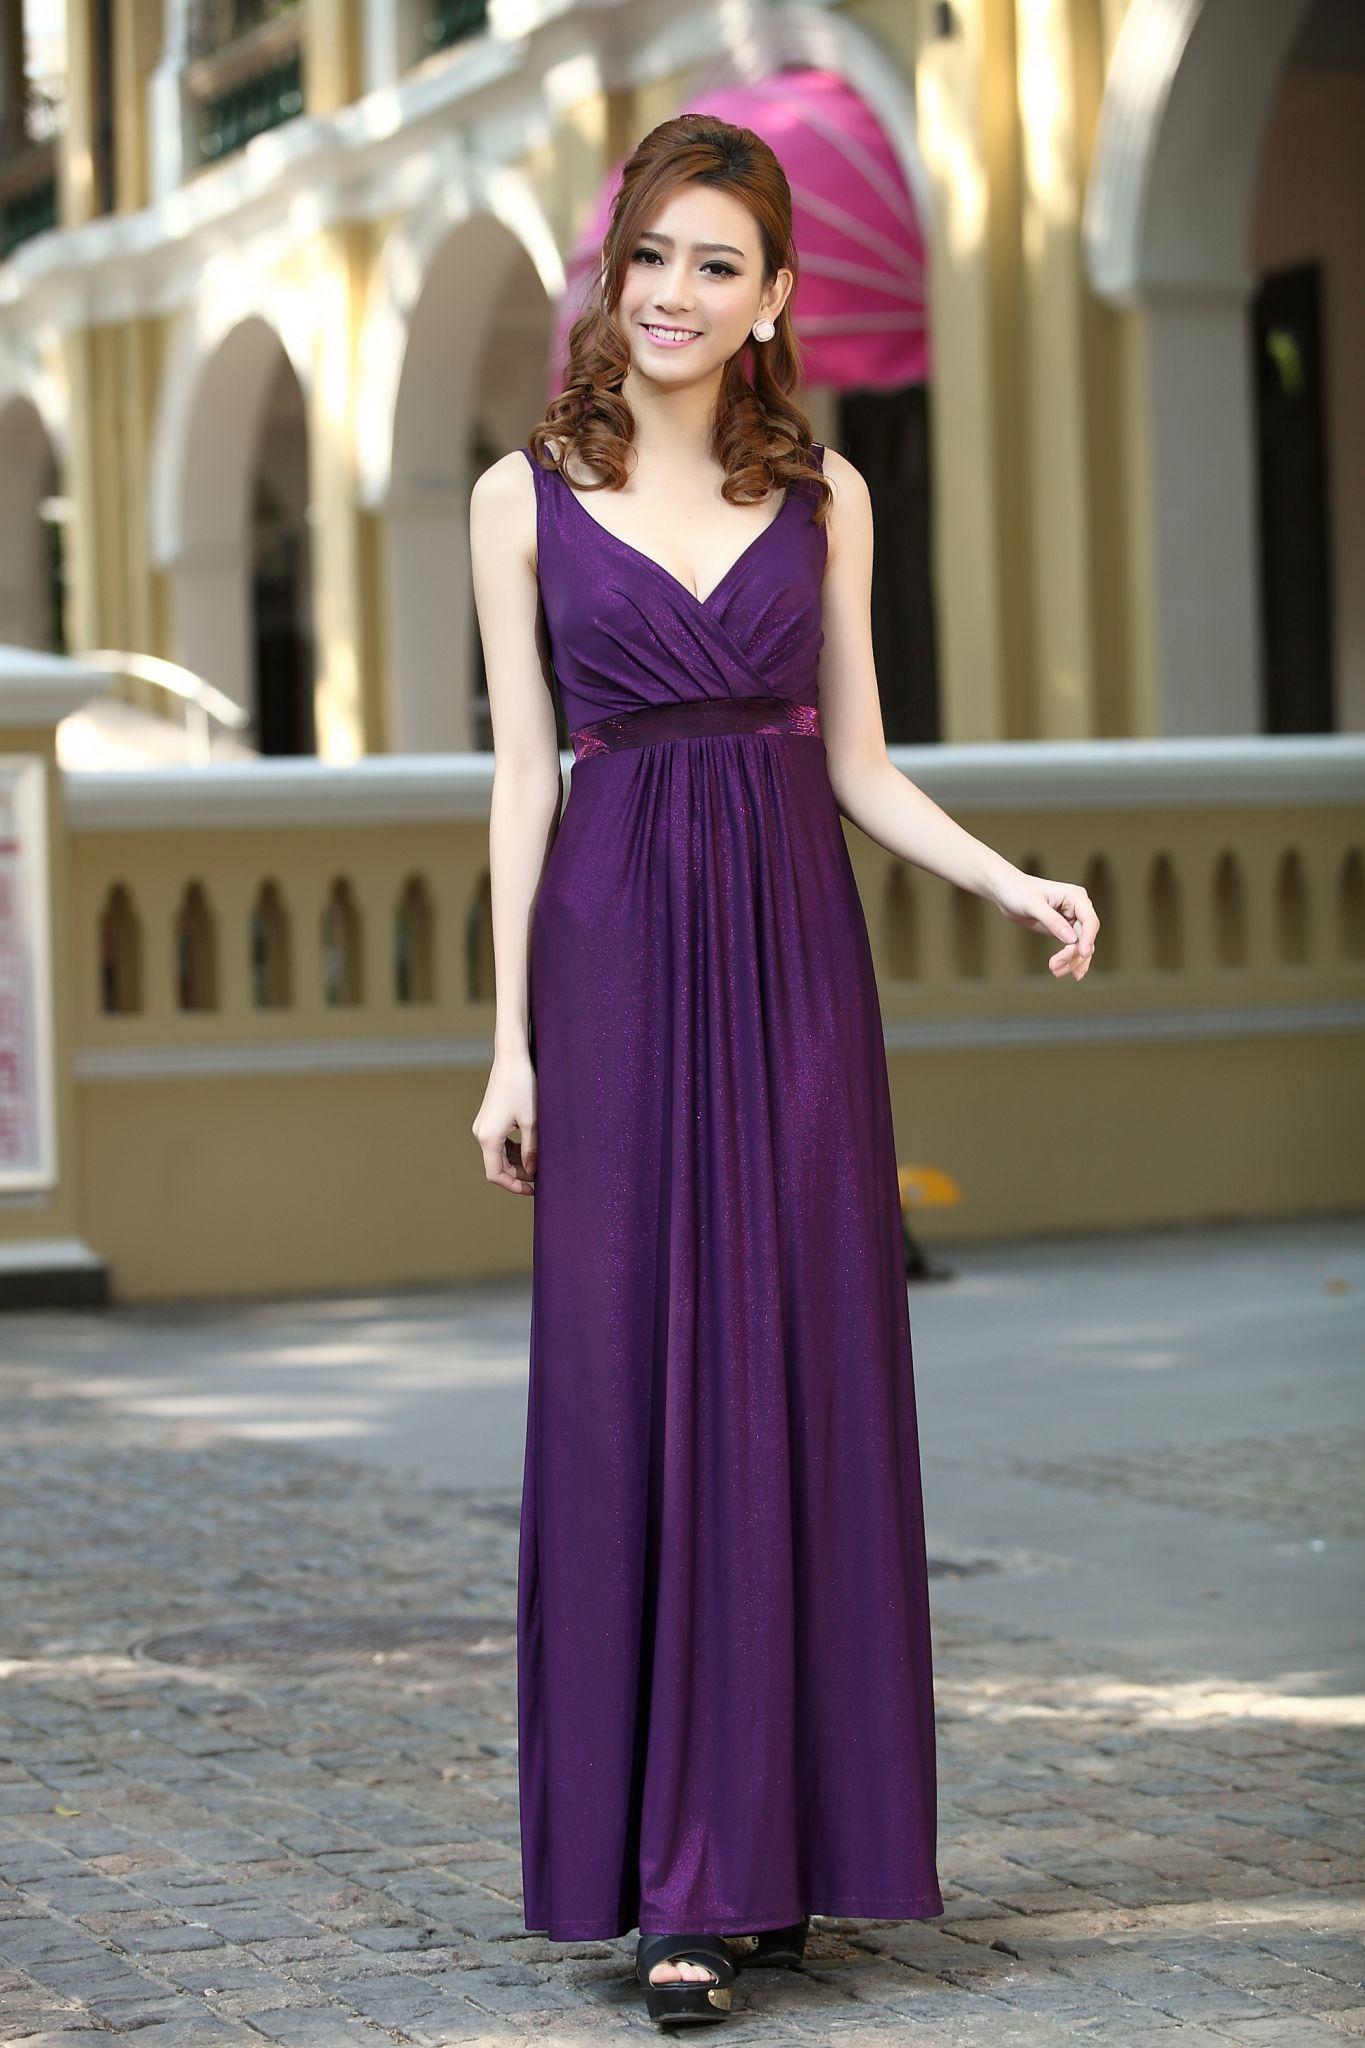 Long maxi dresses for weddings cute dresses for a wedding check